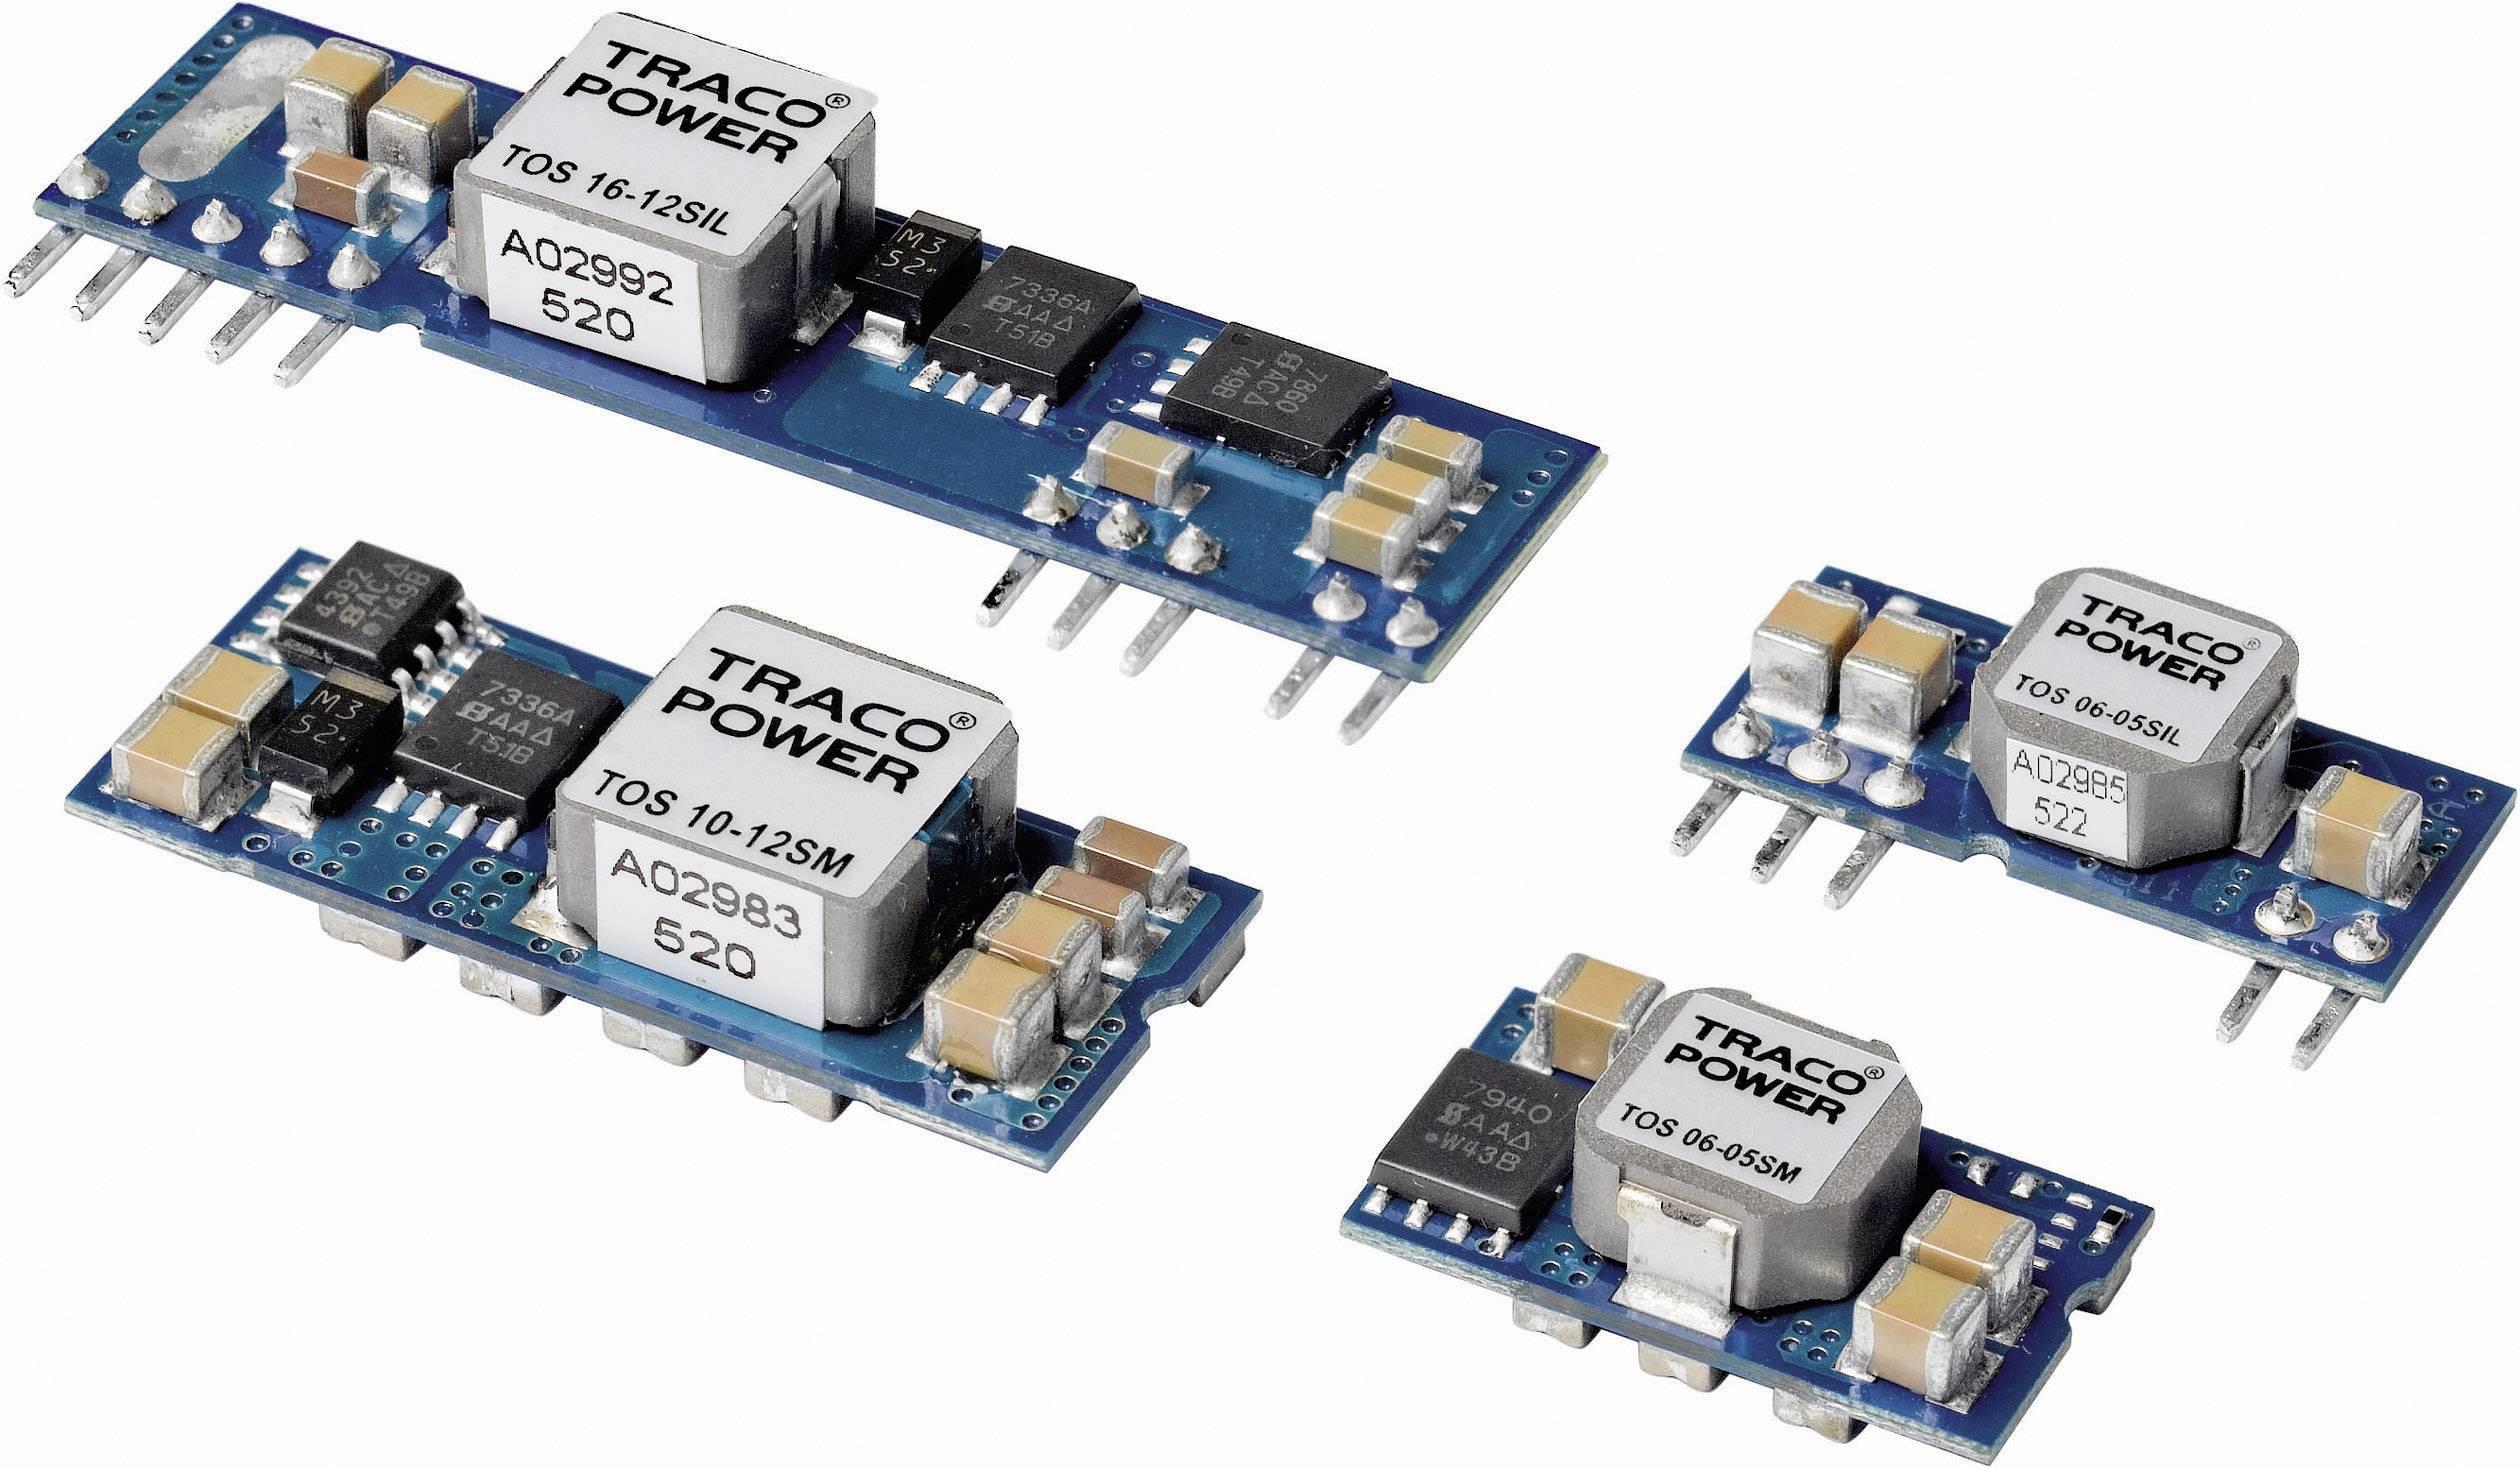 DC/DC měnič TracoPower TOS 10-05SM